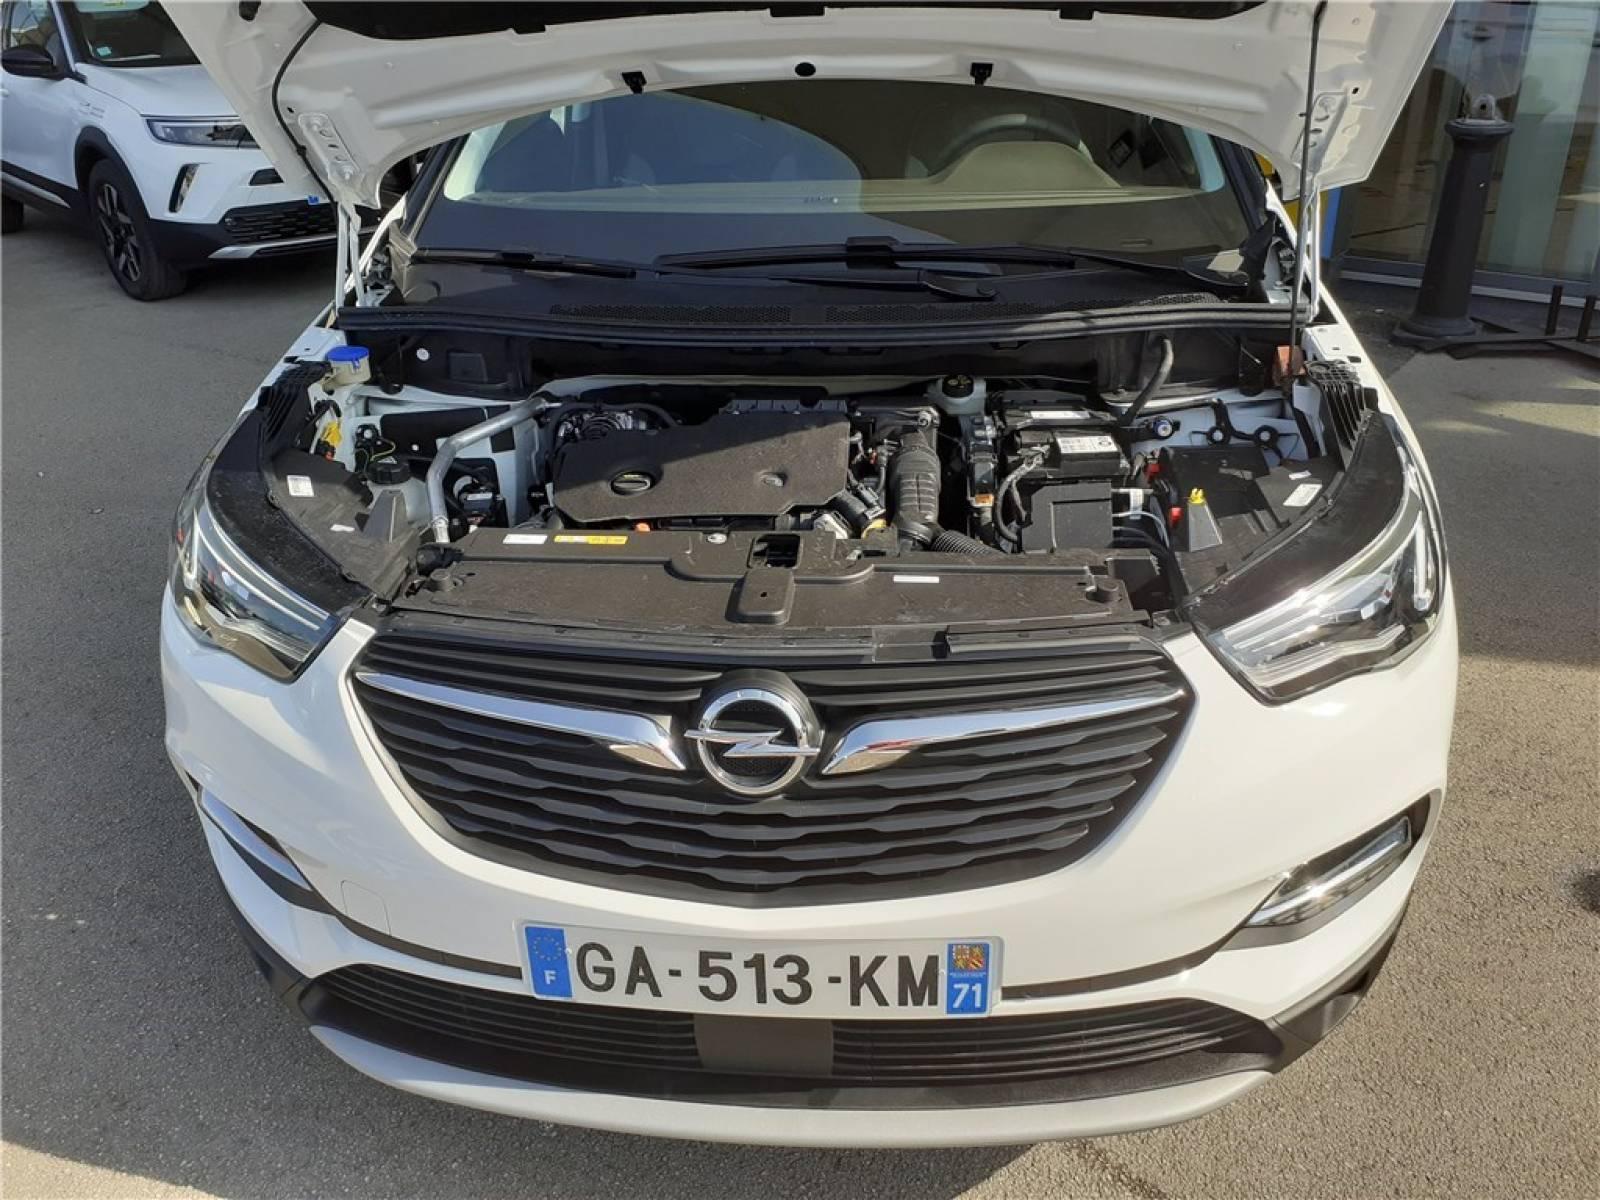 OPEL Grandland X 1.5 Diesel 130 ch BVA8 - véhicule d'occasion - Groupe Guillet - Opel Magicauto - Chalon-sur-Saône - 71380 - Saint-Marcel - 14